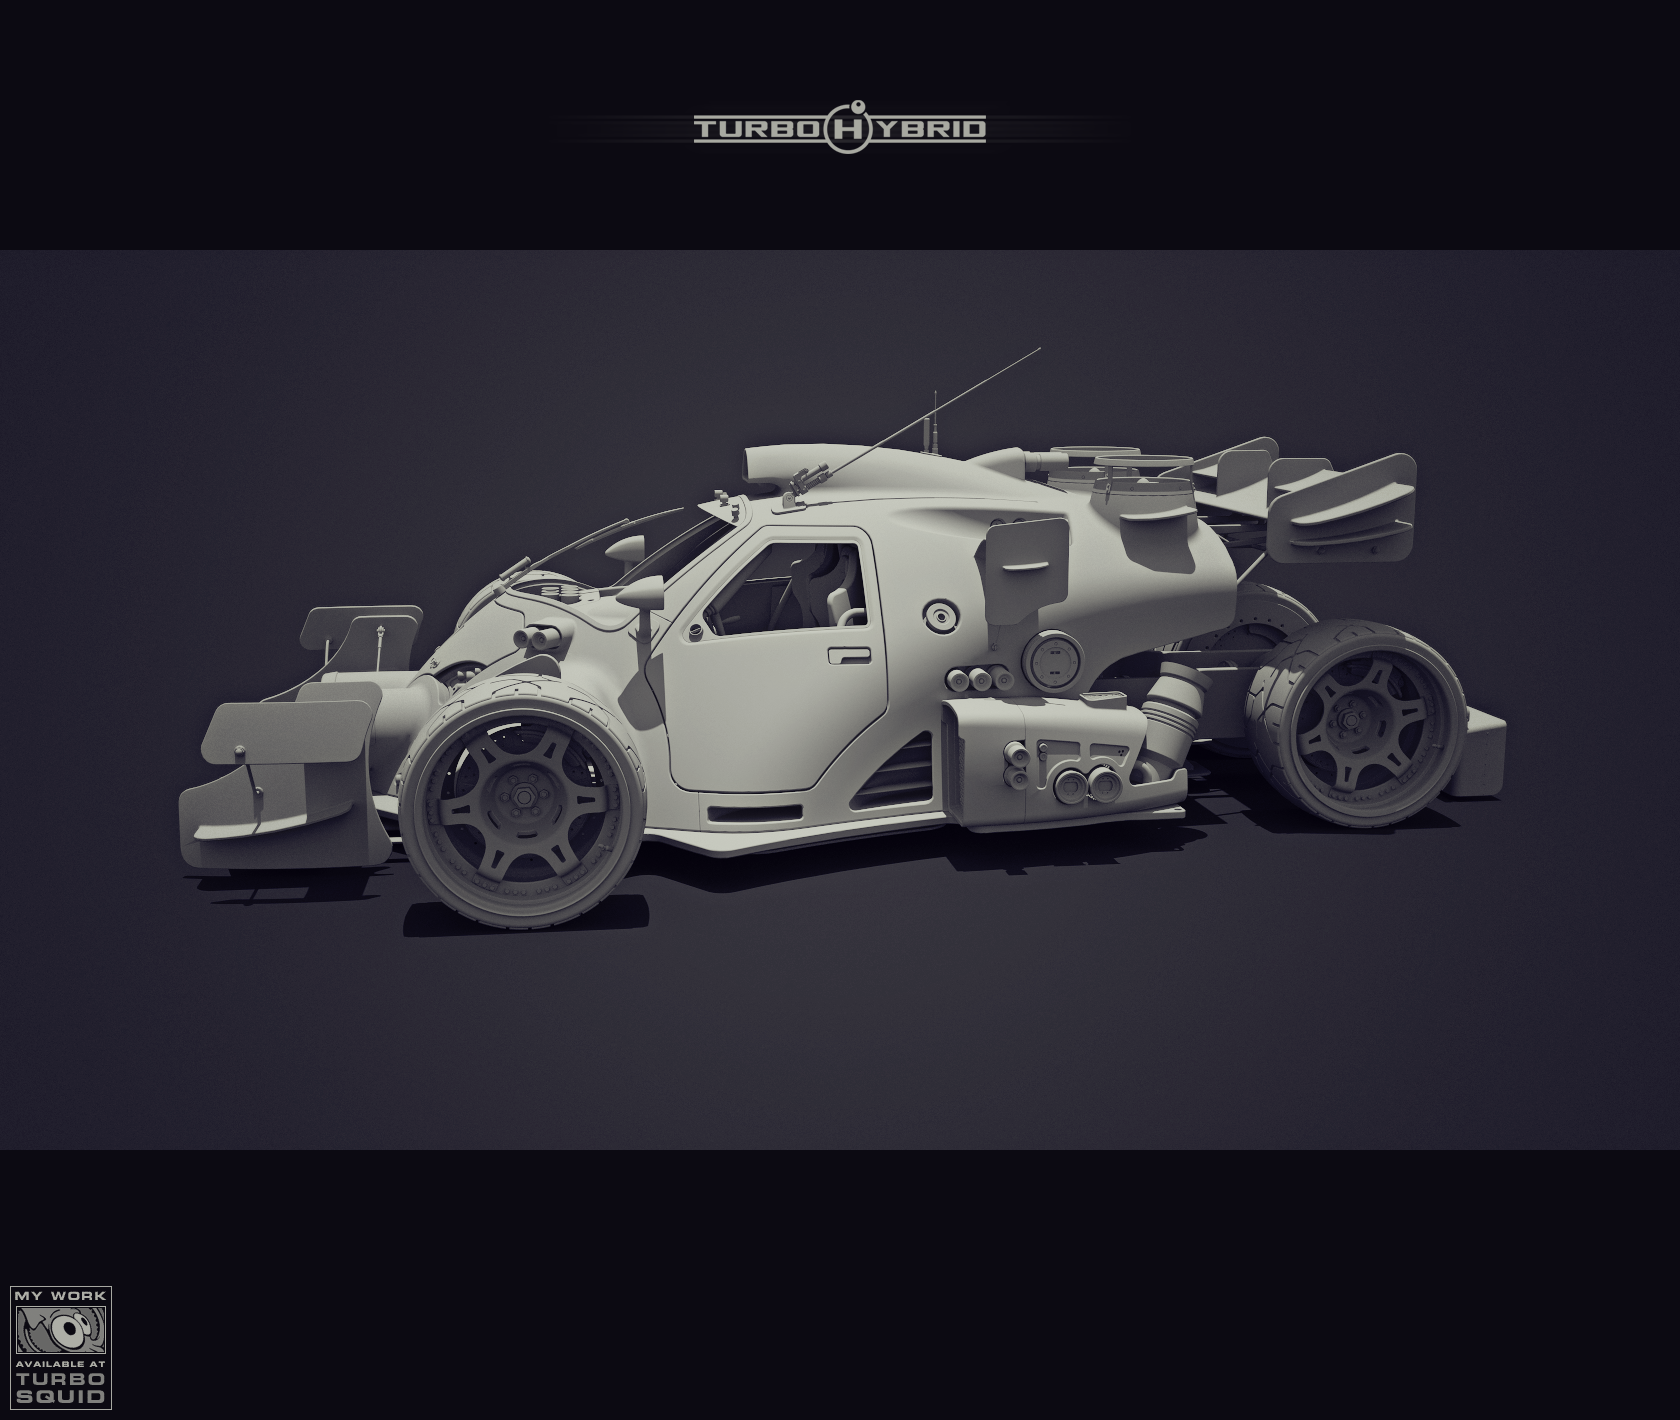 turboHybrid 01.01 by popoff